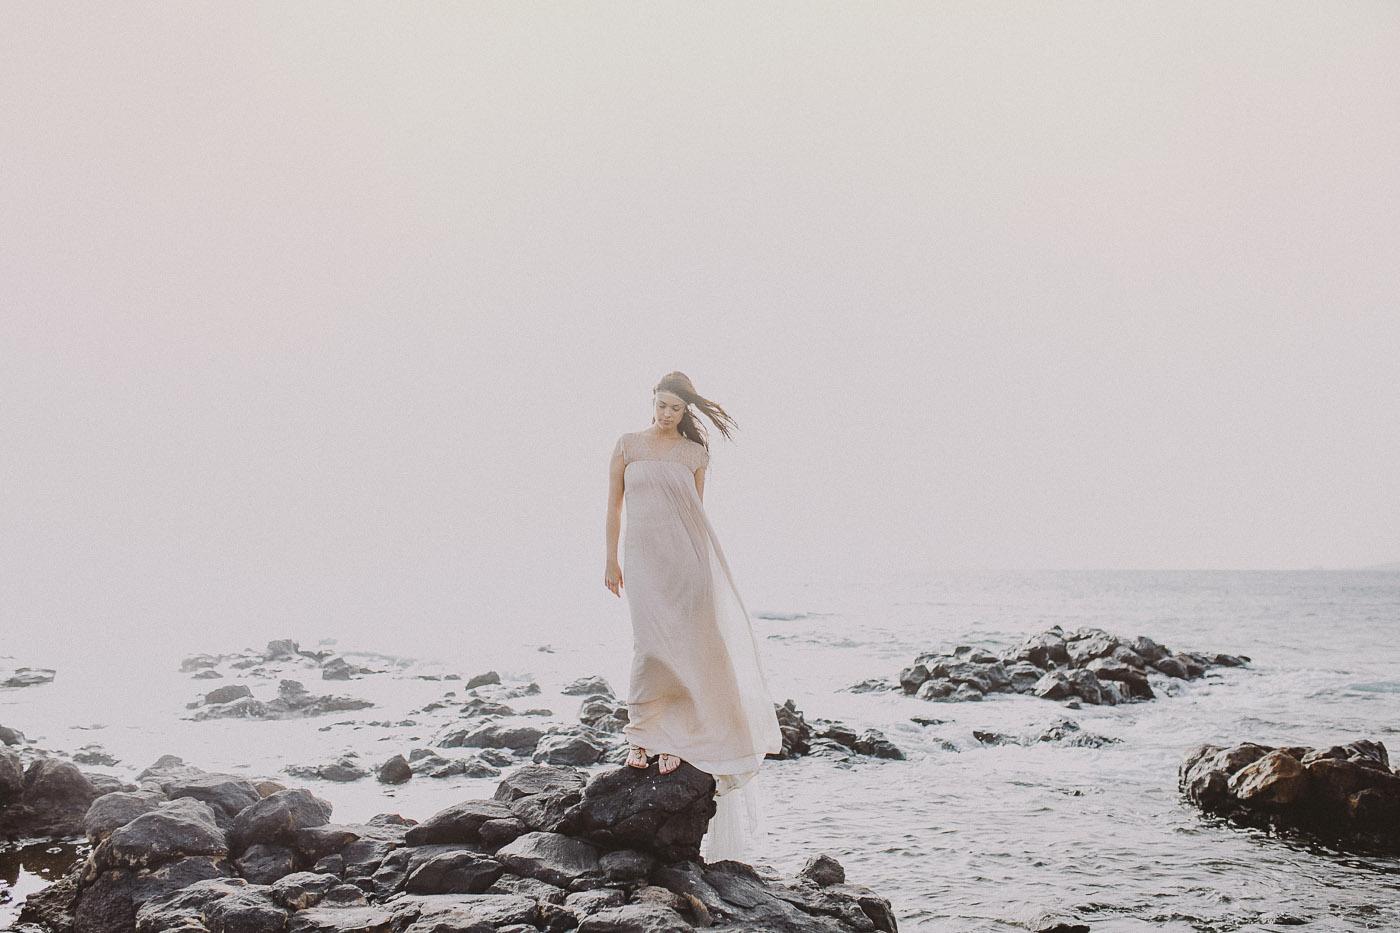 canary-islands-wedding-photographer-10